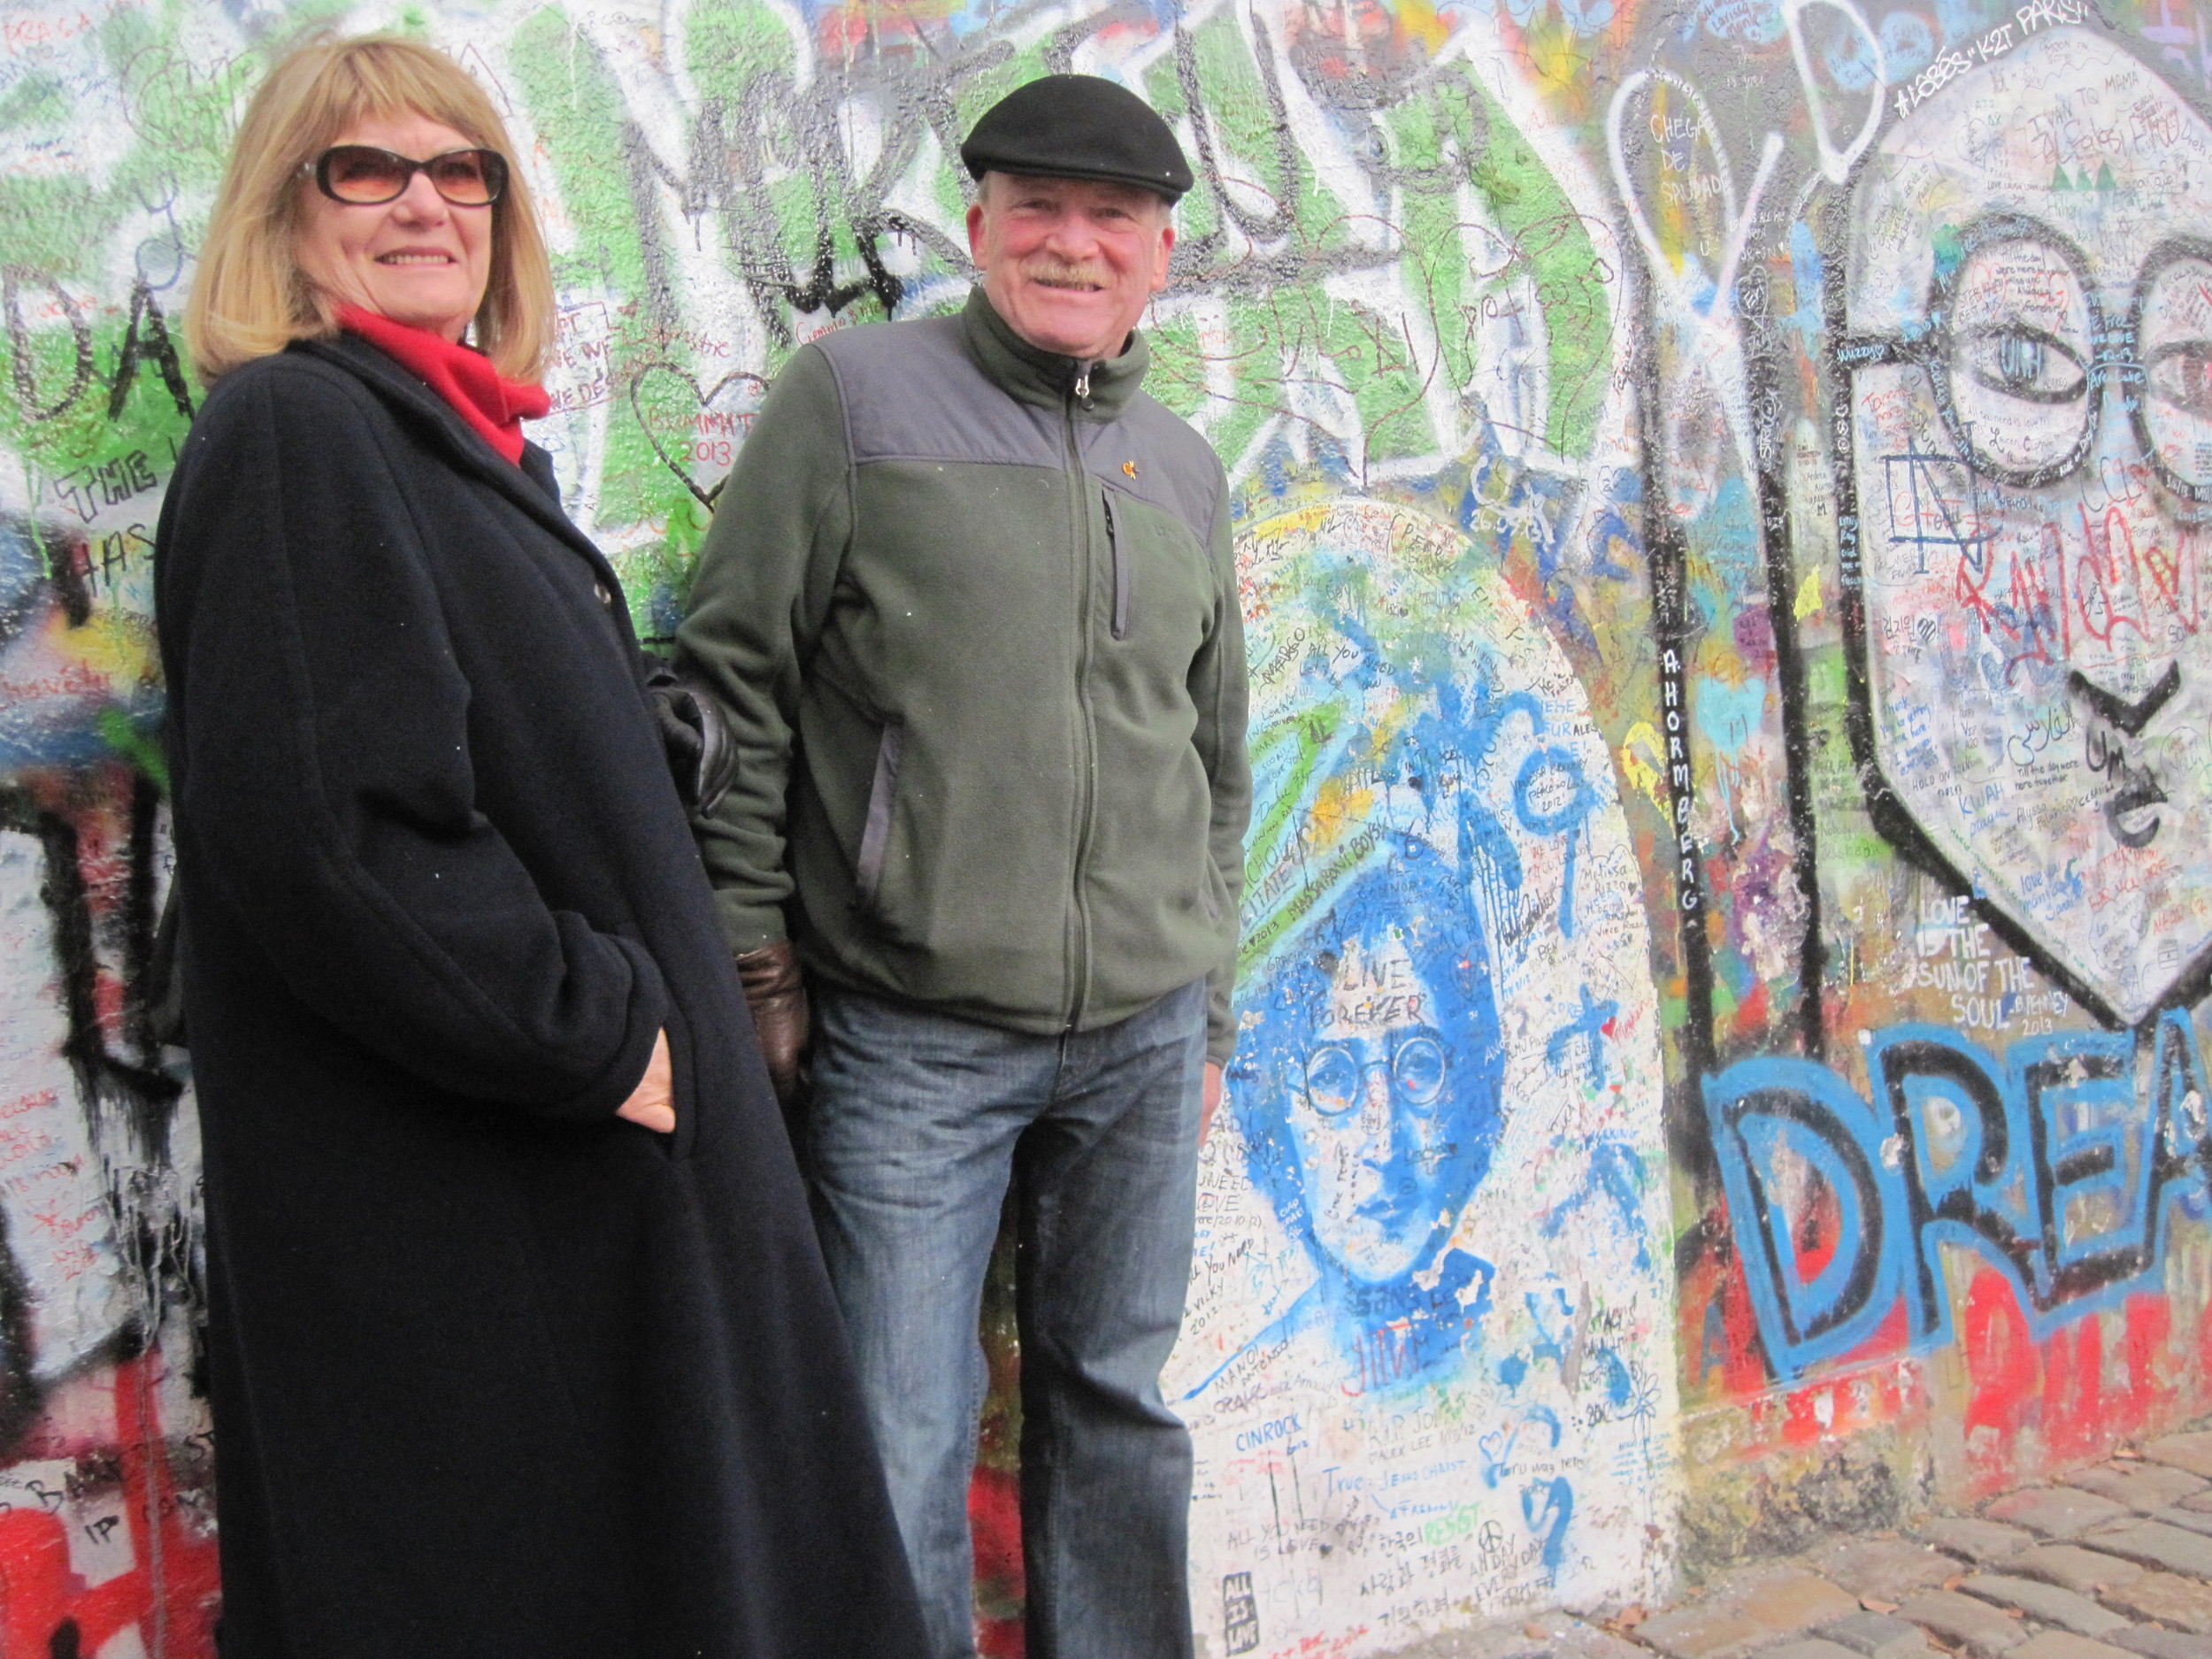 B&B Lennon wall.jpg